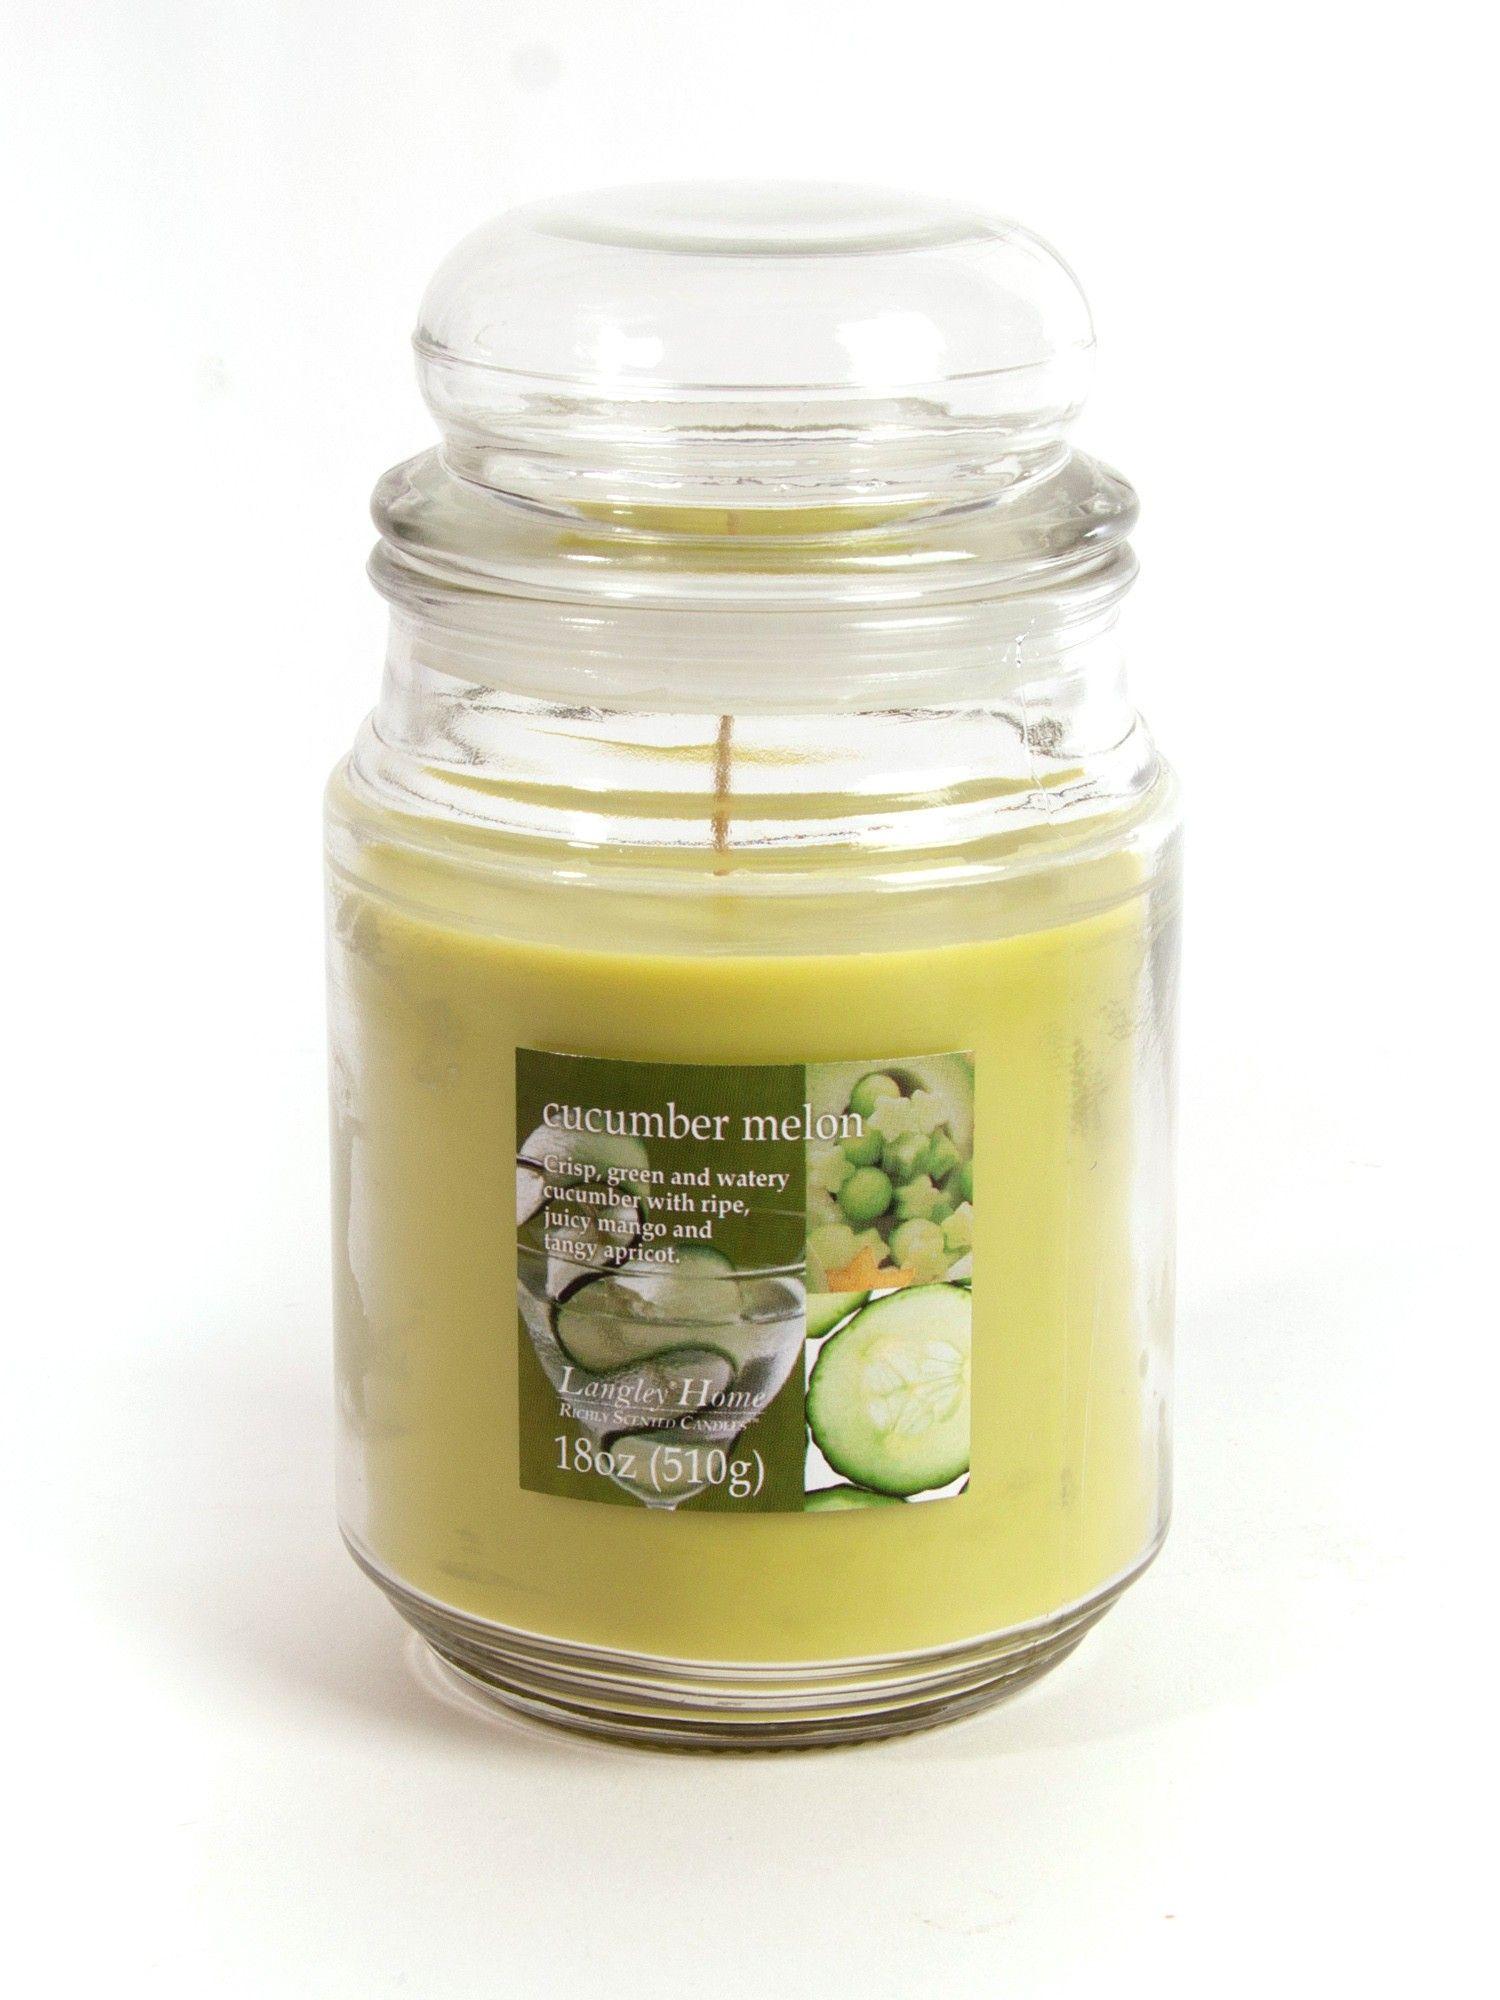 Cucumber Melon Large Jar Occasion Value Candle @ Clinton's